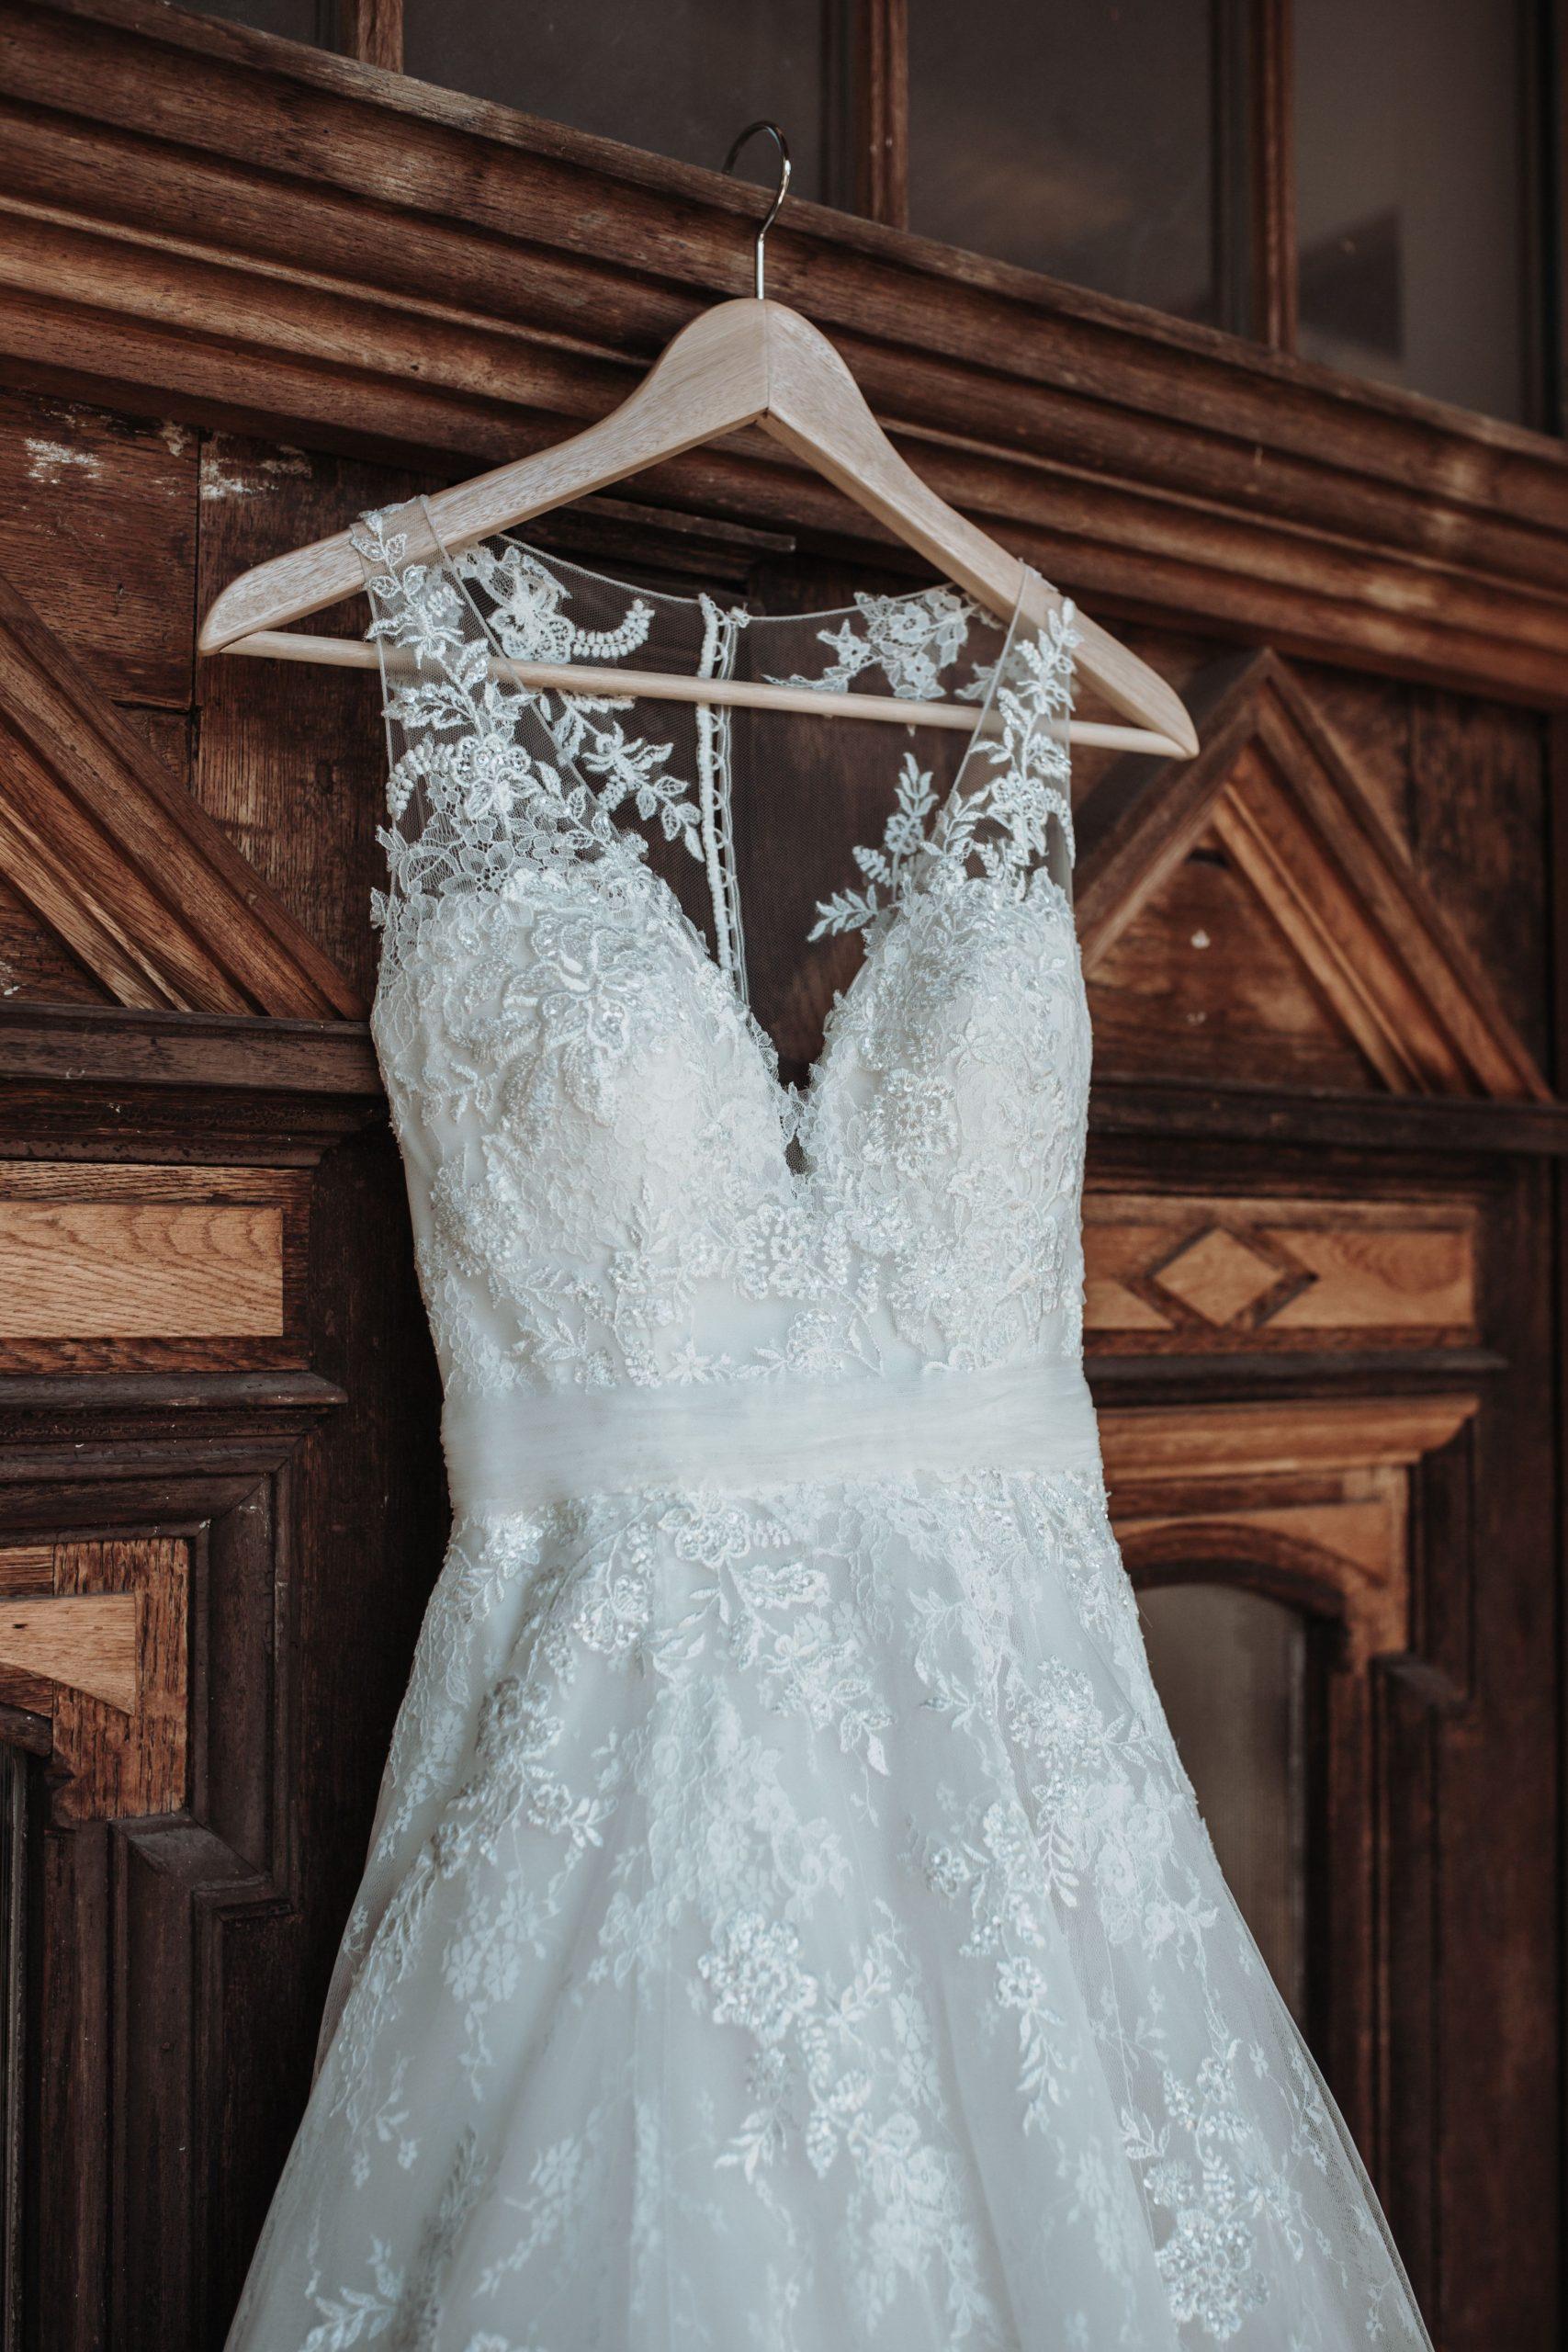 Getting Ready Bride Weddingdress , Braut, Hochzeitskleid